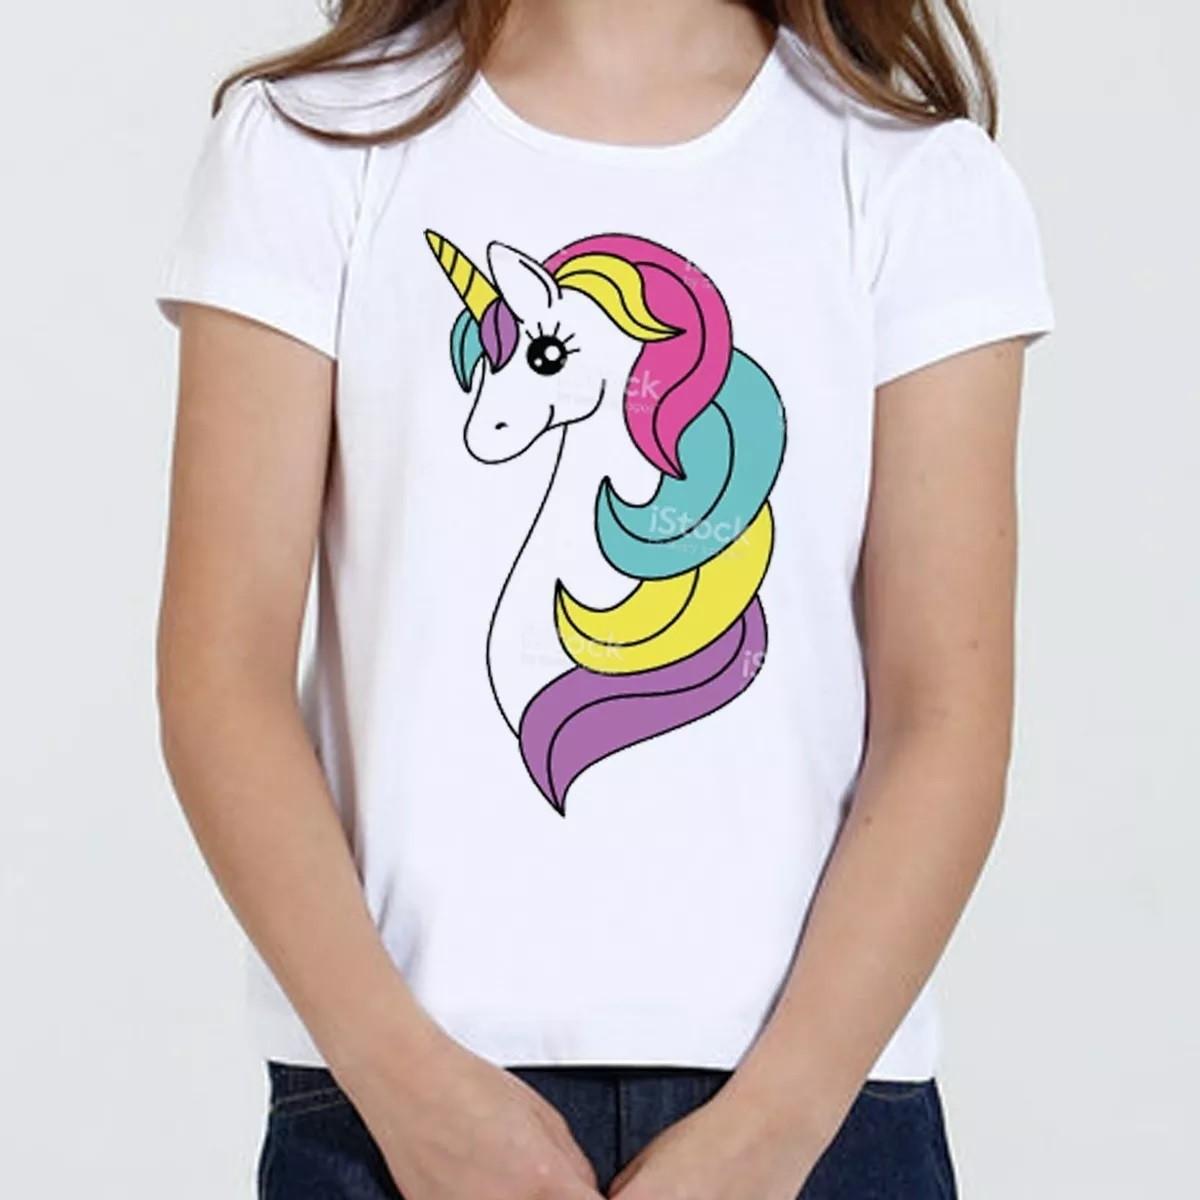 Camiseta Camisa Infantil Feminina Unicornio Kawaii Tumblr No